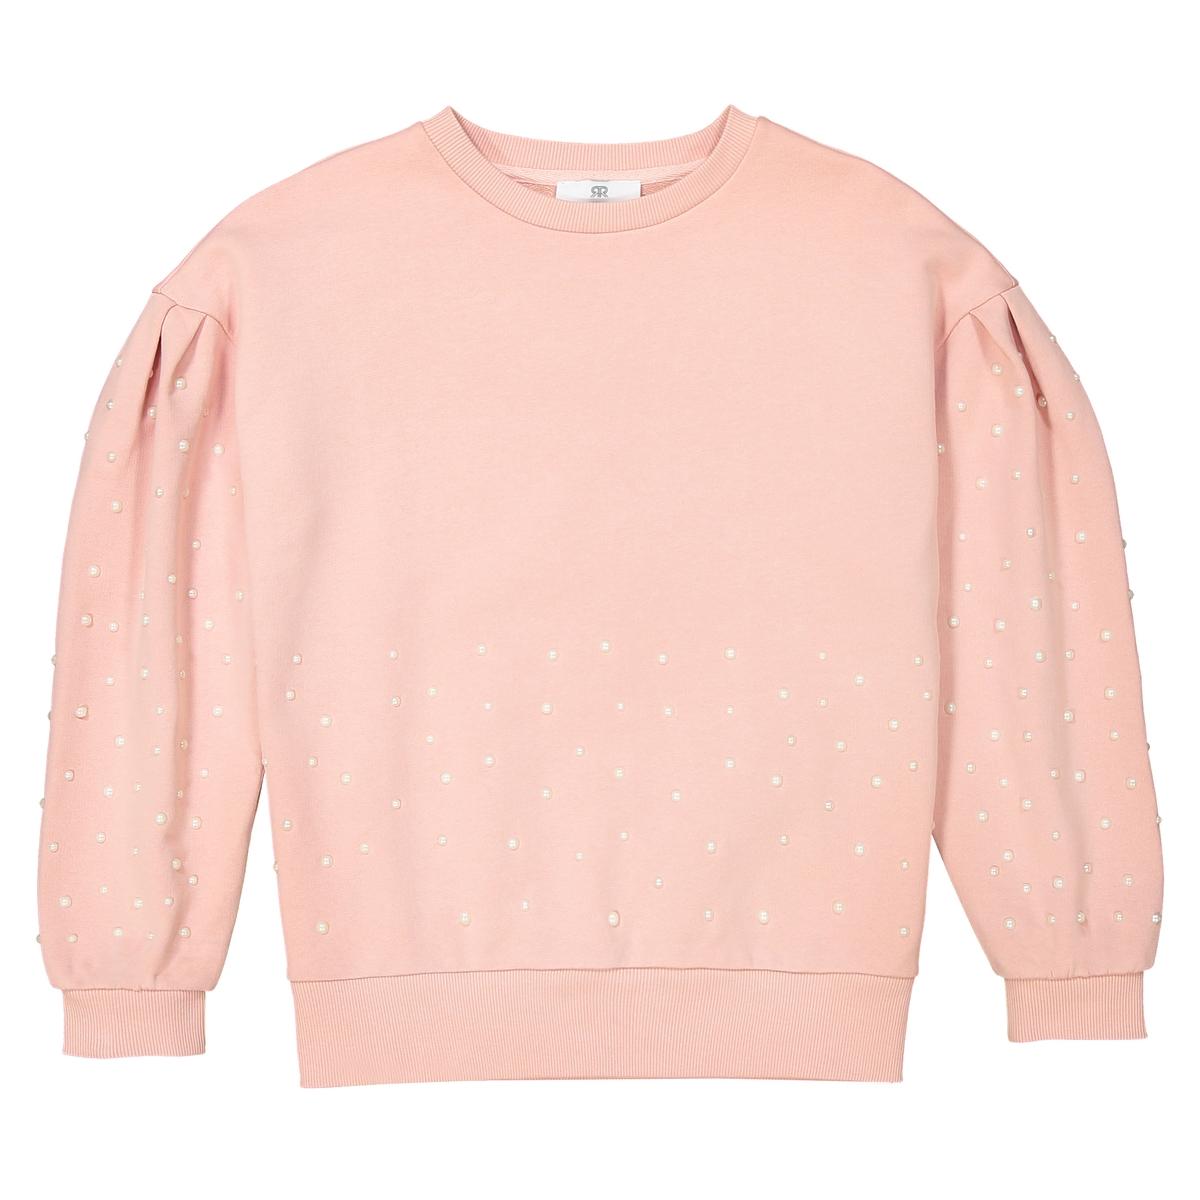 Свитшот La Redoute С капюшоном 16 лет - 162 см розовый свитшот la redoute с рисунком спереди мес лет 1 мес 54 см желтый